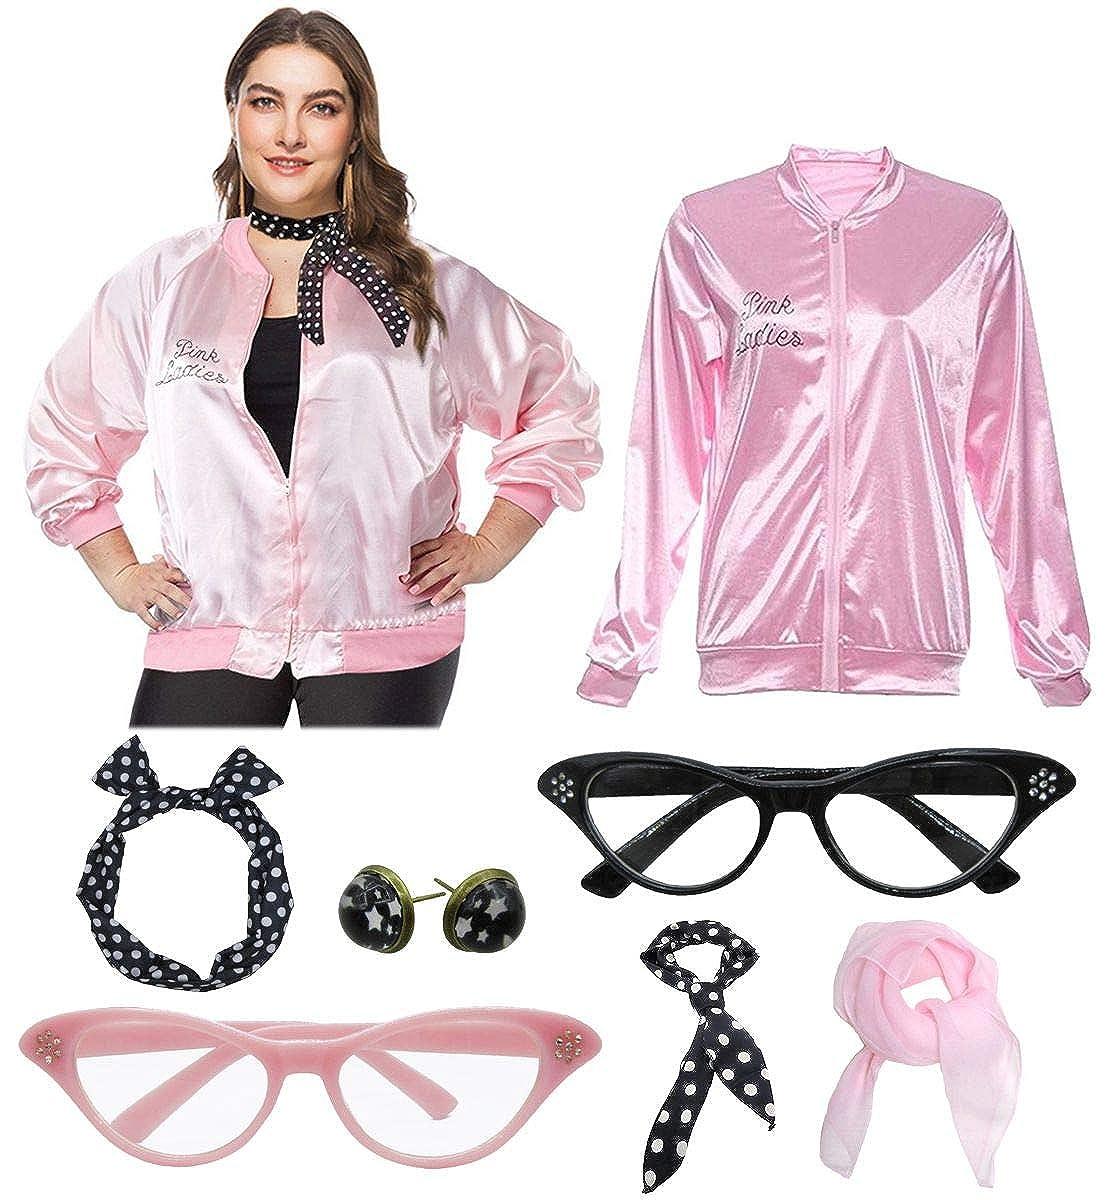 1950s Women Plus Size Pink Ladies Jacket with Cat Eye Glasses Headband Set